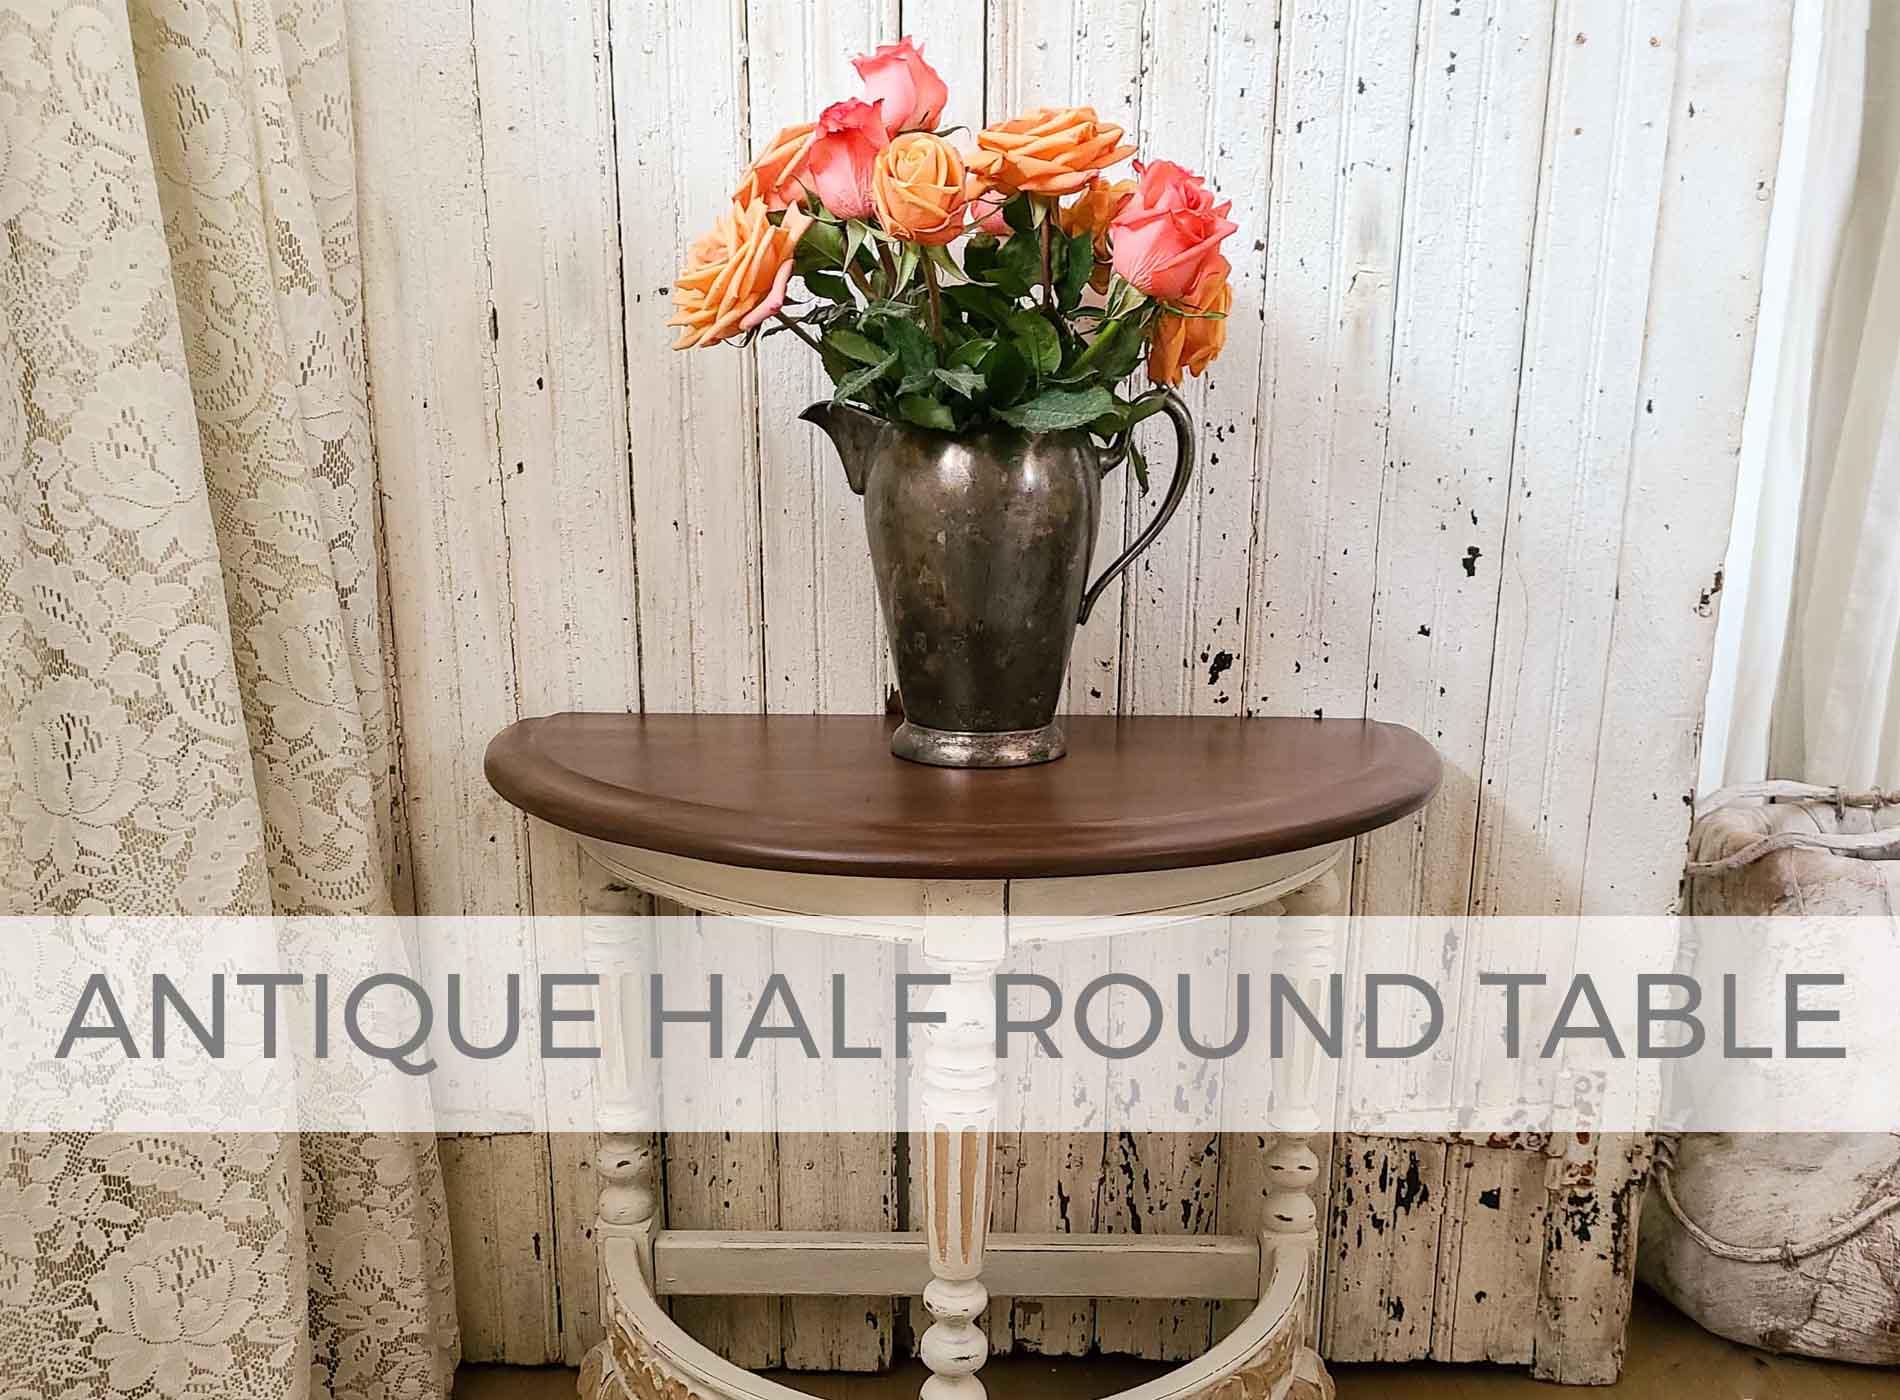 Antique Half Round Table Makeover by Larissa of Prodigal Pieces | prodigalpieces.com #prodigalpieces